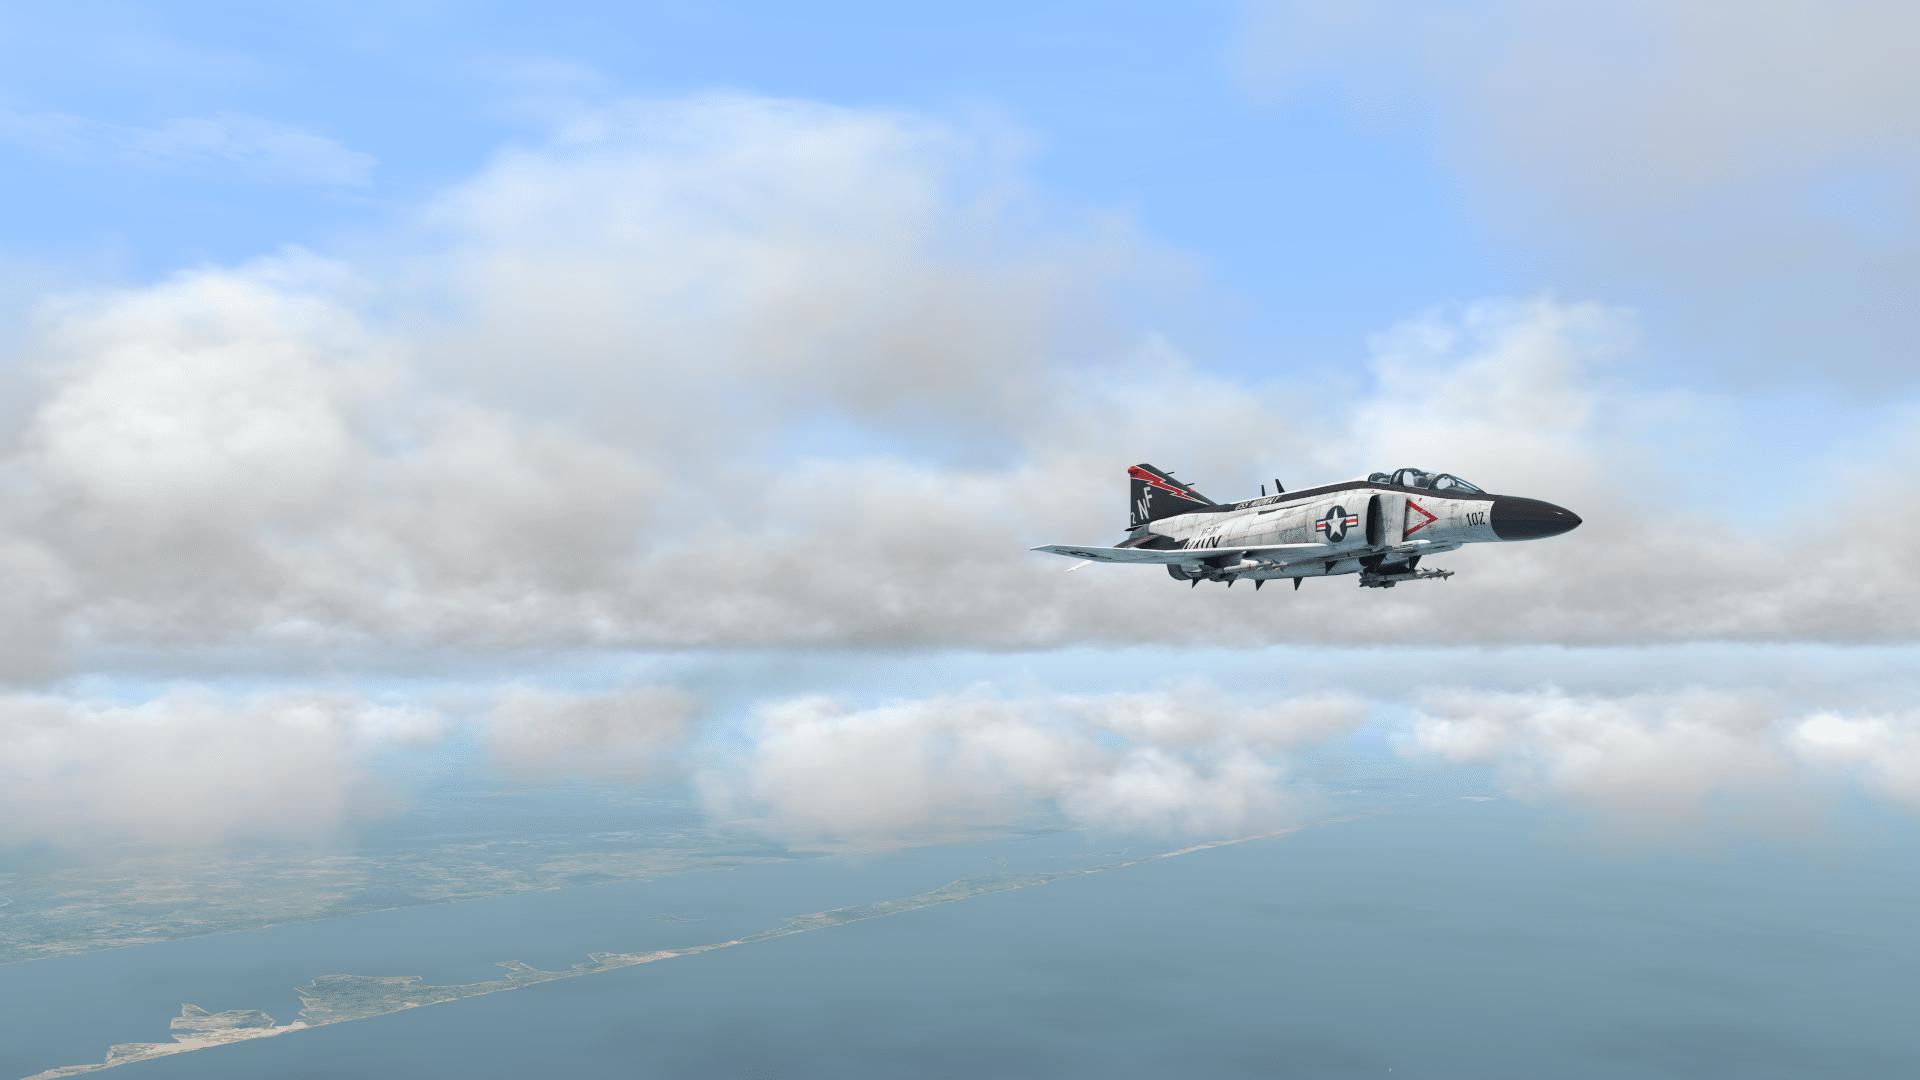 F-4-2020-04-30-11.08.52